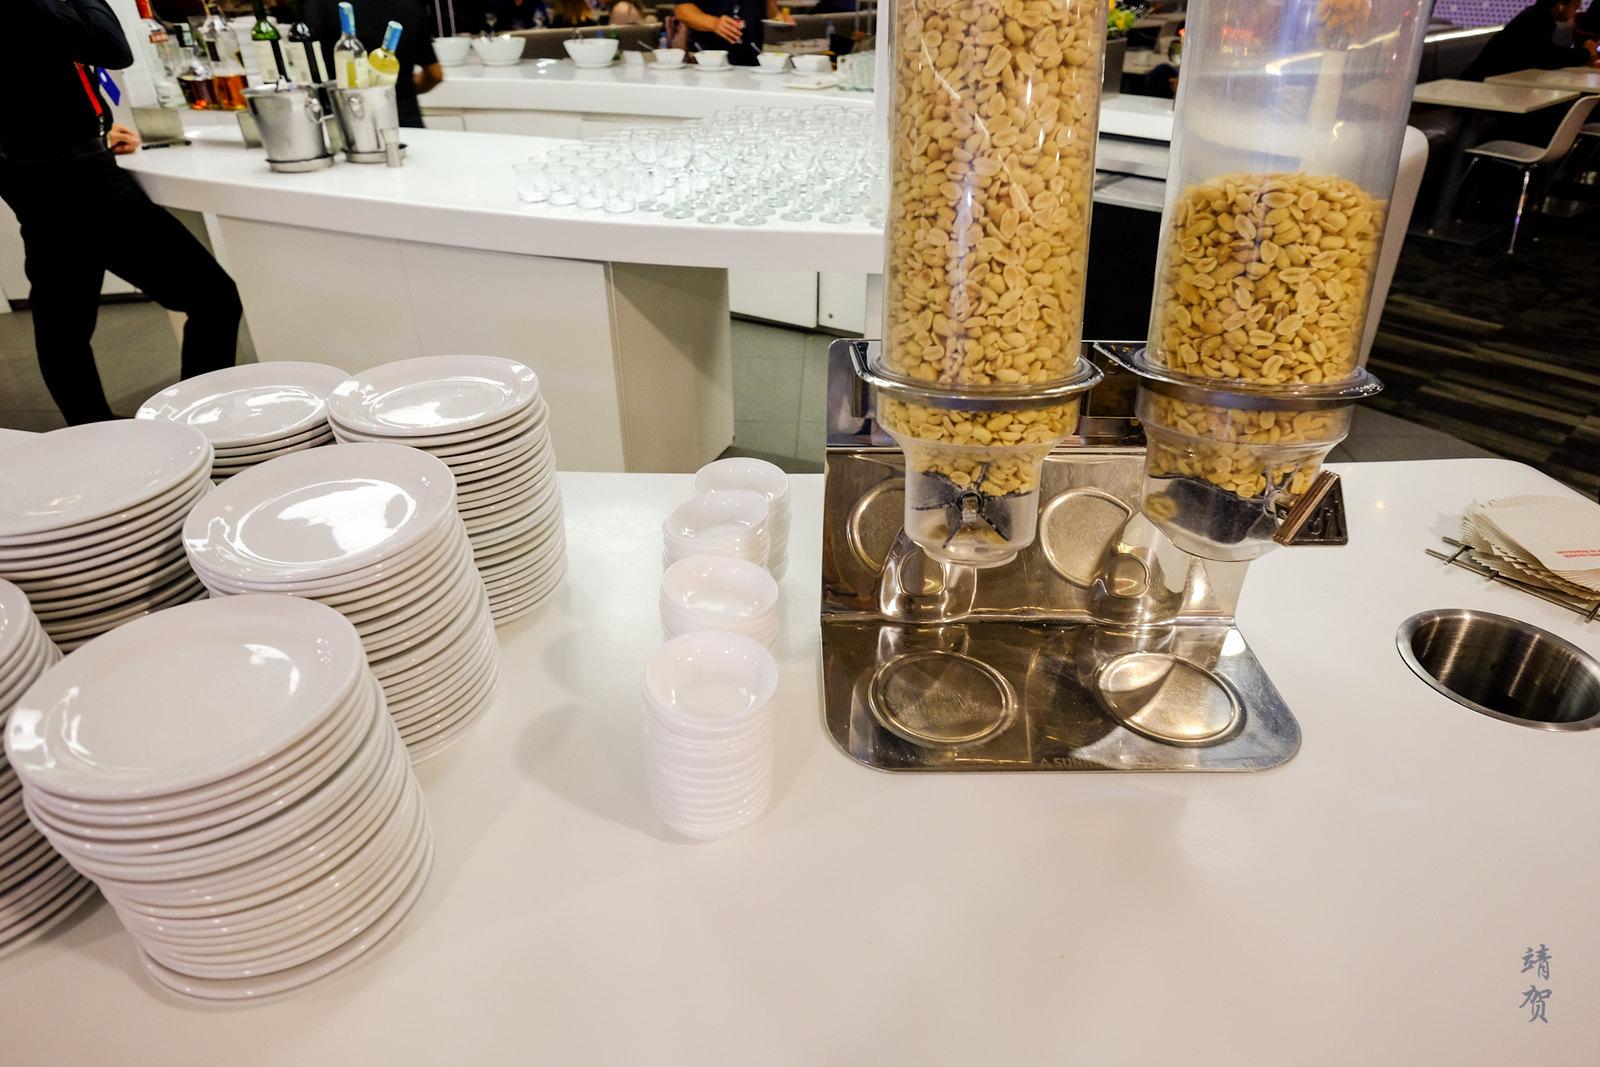 Nuts dispenser